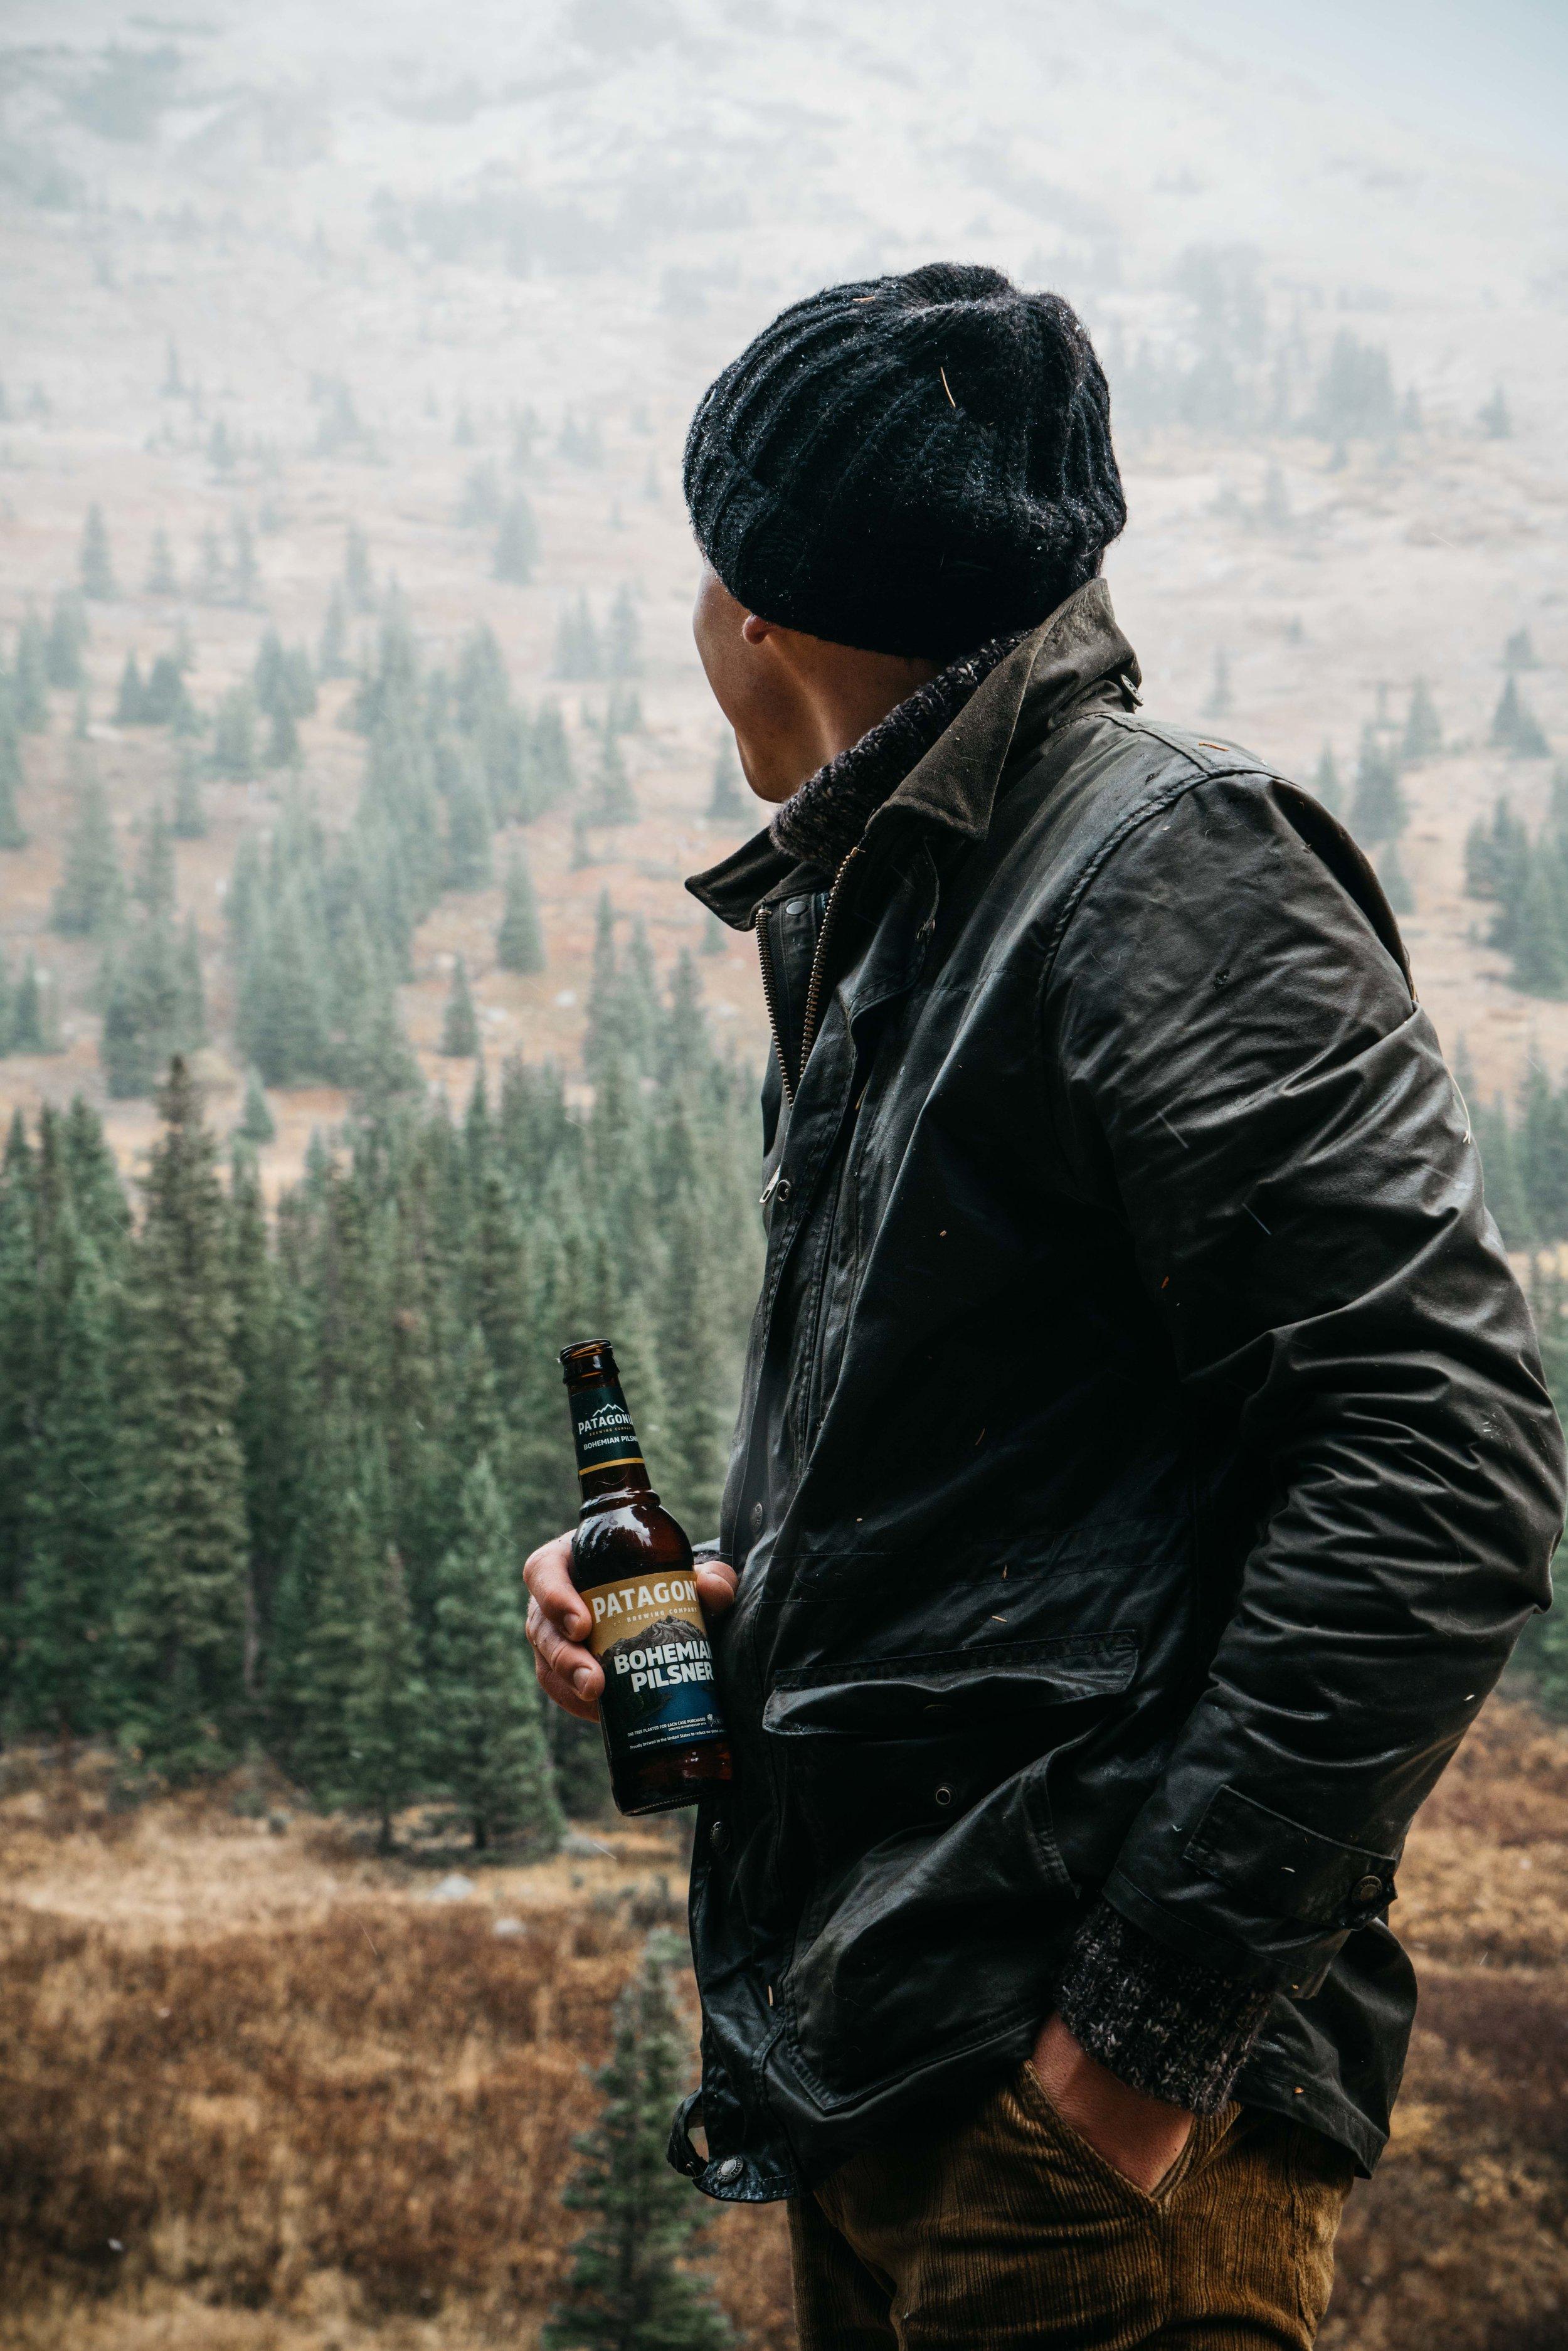 cerveza-patagonia-web-6.jpg